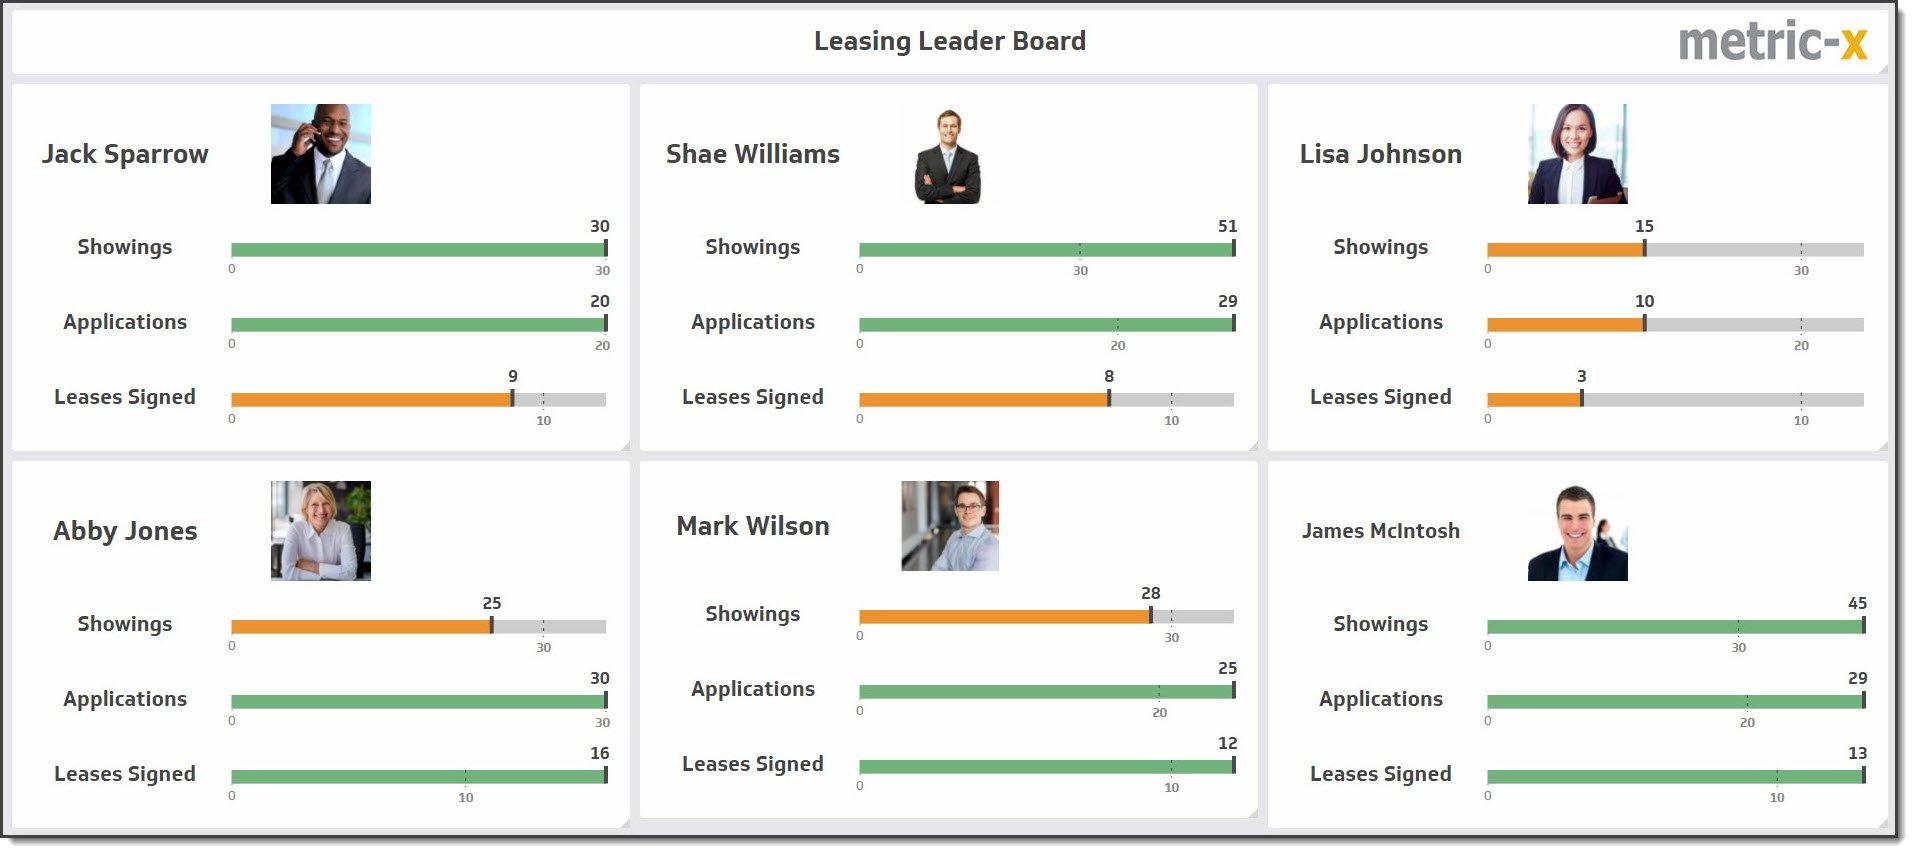 Property Management Metrics Leasing Real Estate KPI MetricX - Board dashboard template